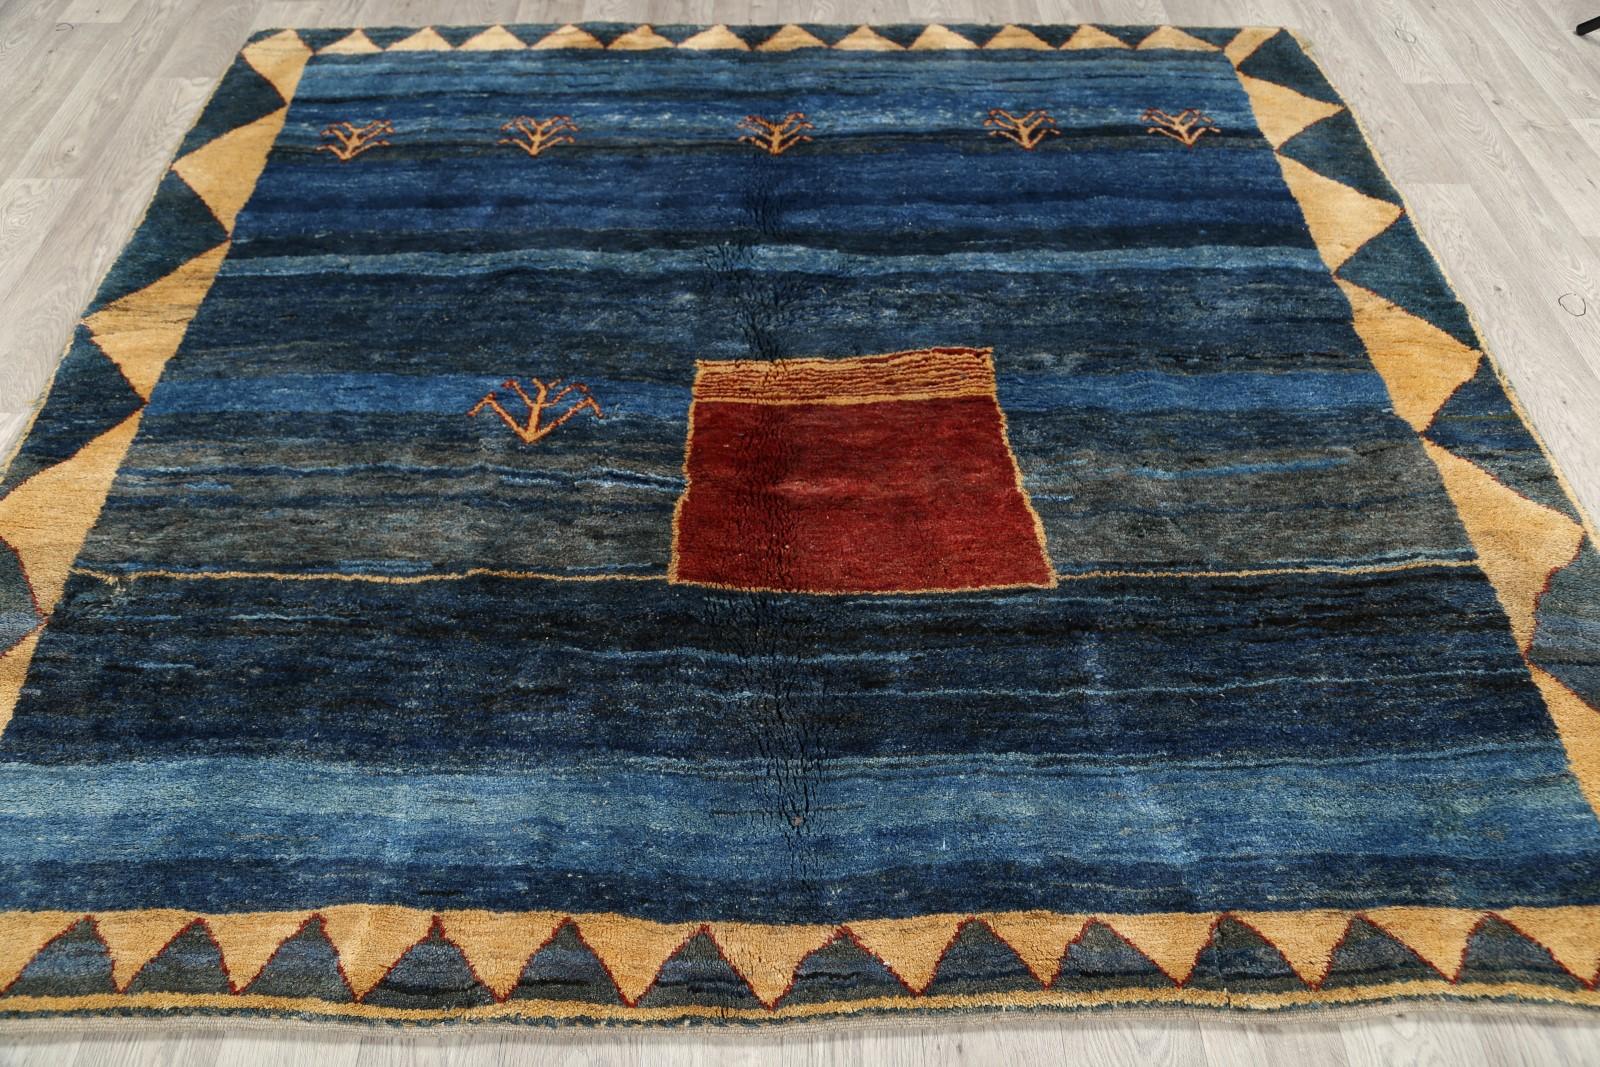 great thick pile square 7x7 gabbeh persian area rug oriental carpet 7 39 5 x 7 39 ebay. Black Bedroom Furniture Sets. Home Design Ideas